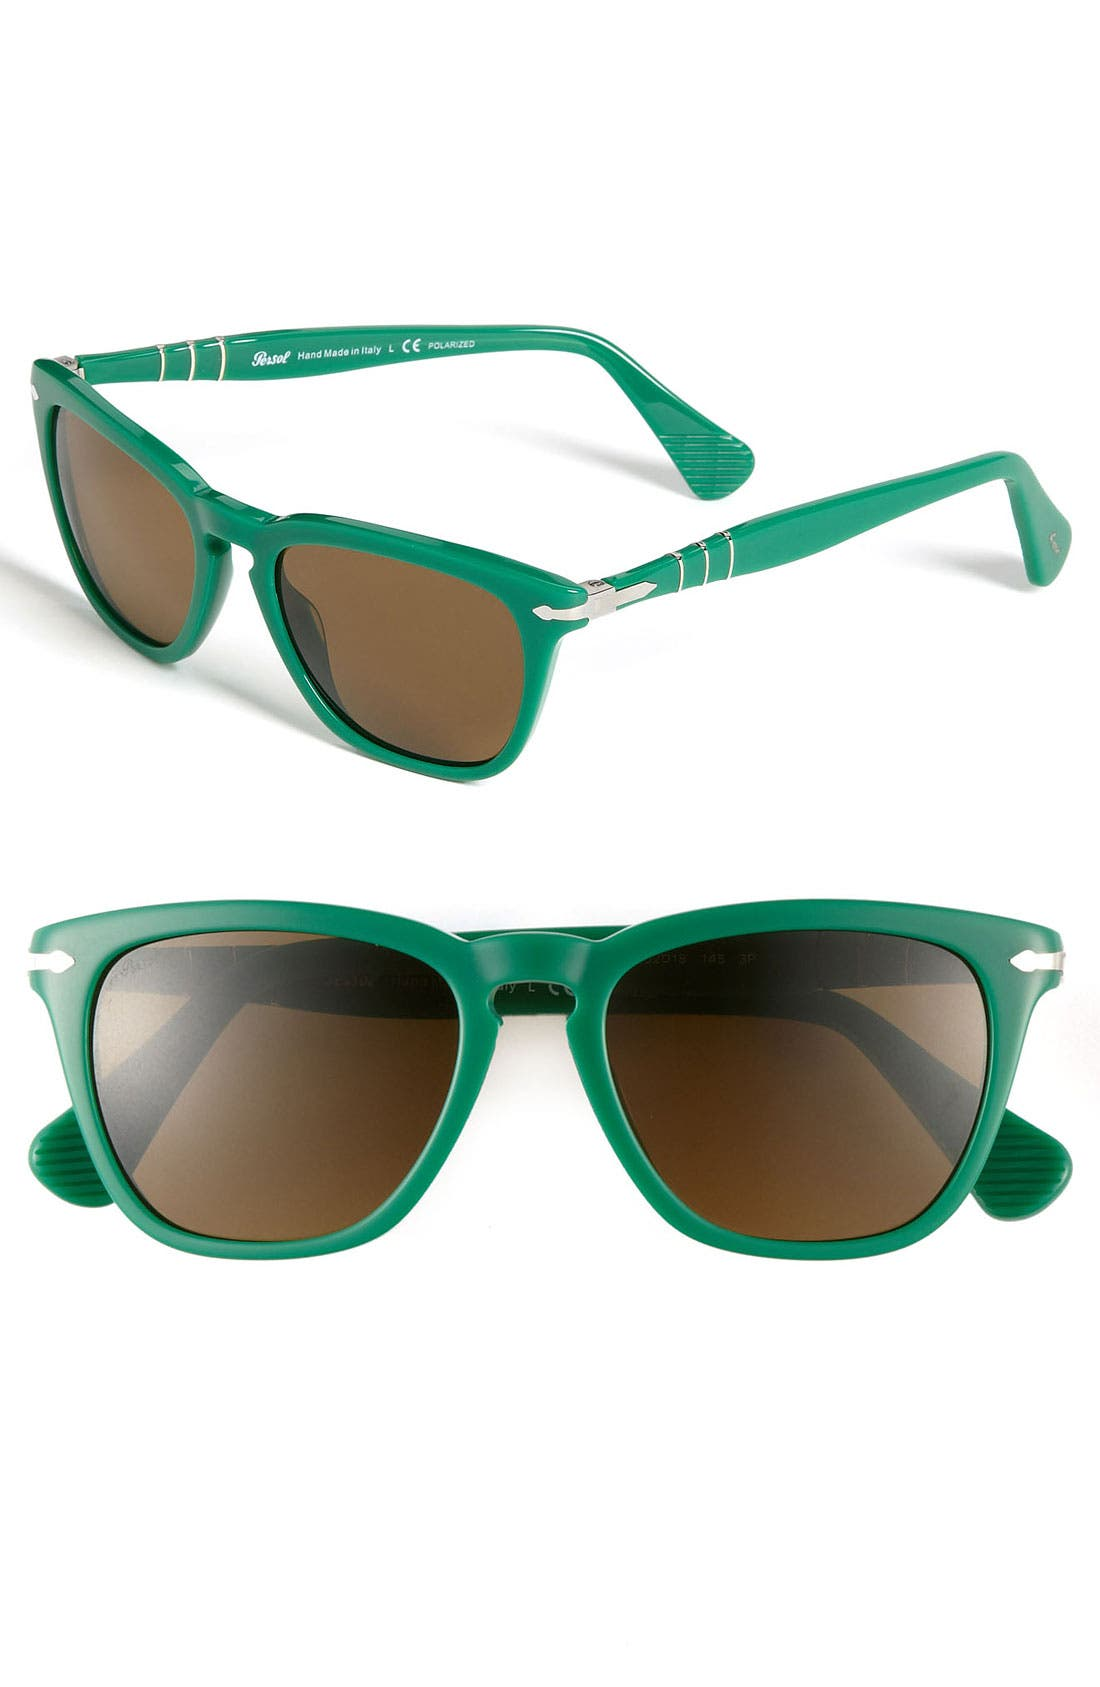 Alternate Image 1 Selected - Persol 52mm Polarized Retro Sunglasses